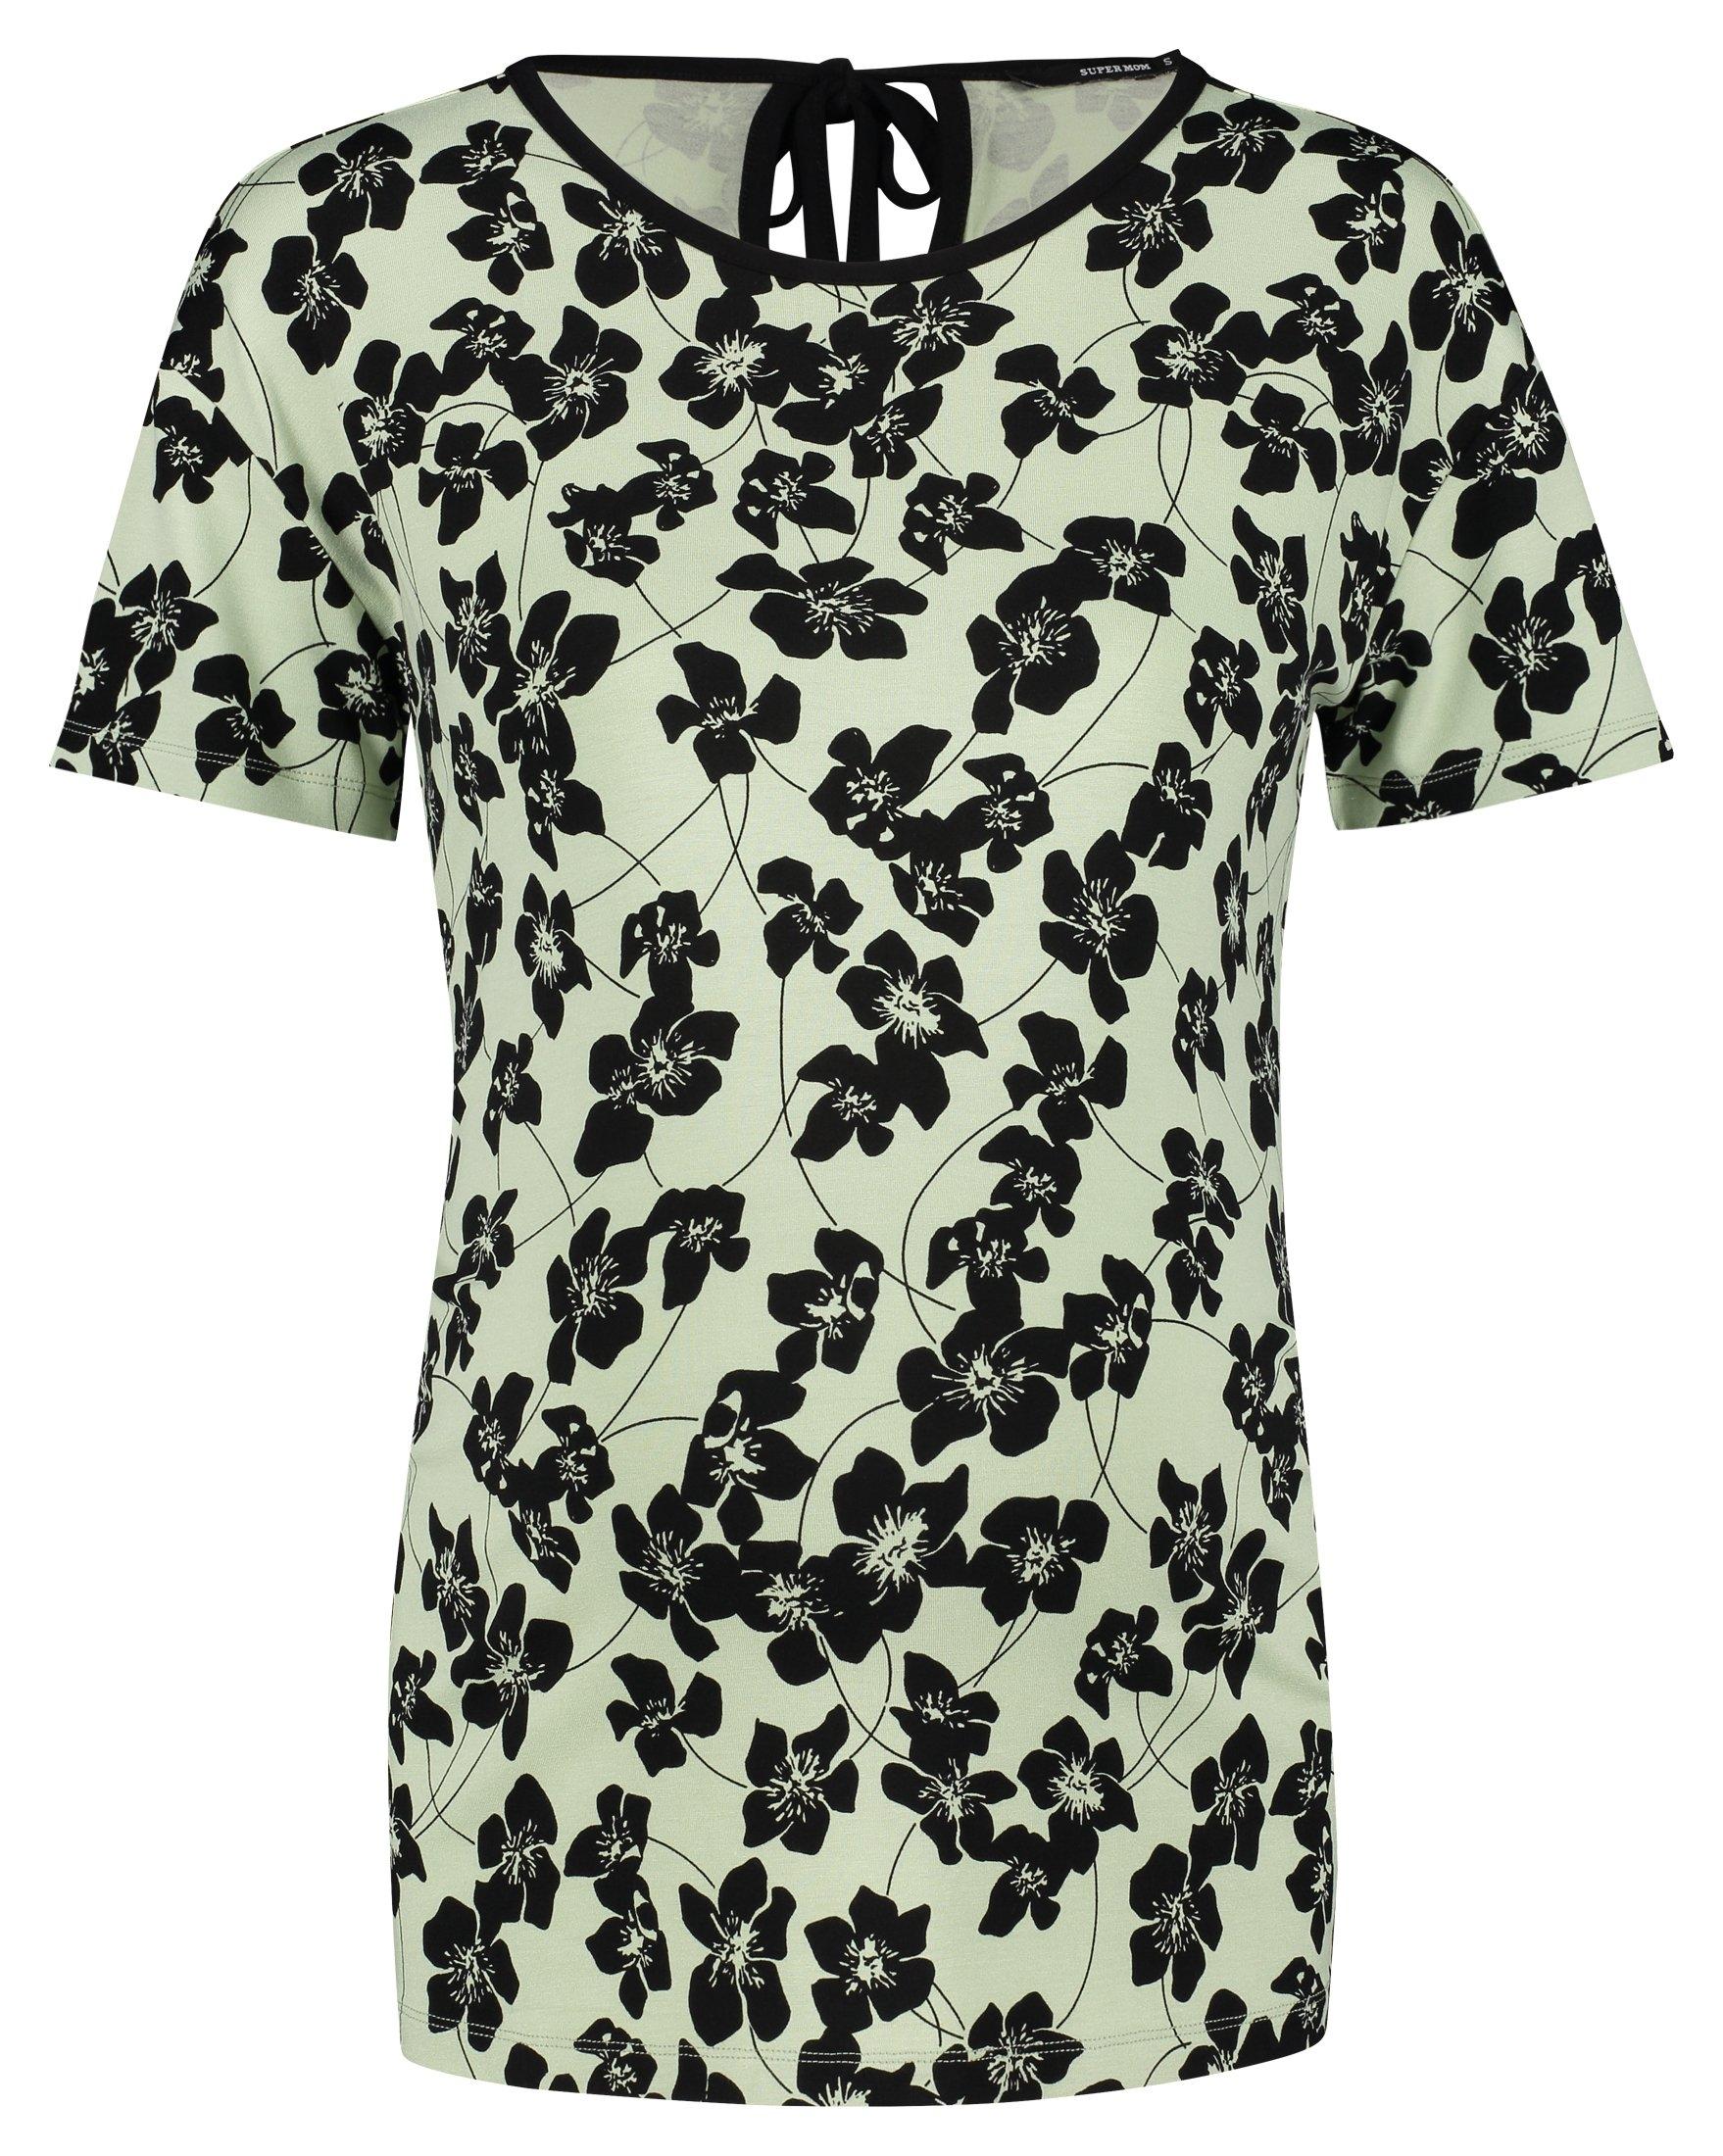 Supermom t-shirt »Green Flower« goedkoop op otto.nl kopen